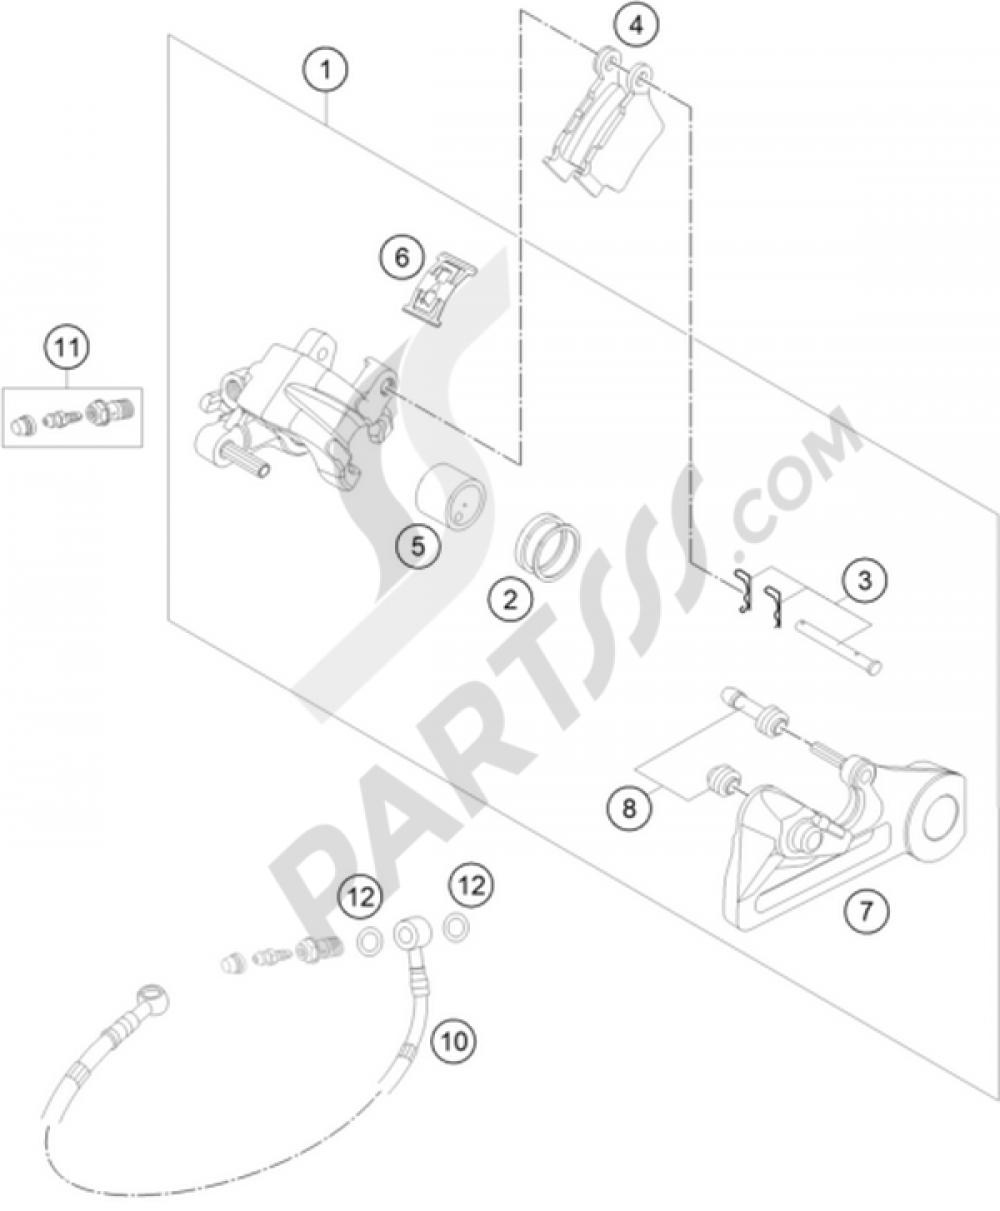 hight resolution of ktm 520 exc wiring diagram